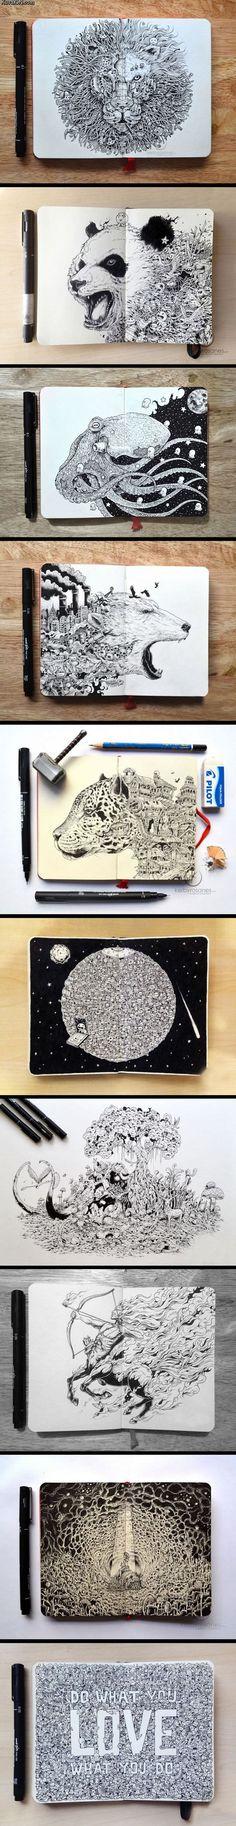 Funny pictures about Hyper-Detailed Drawings. Oh, and cool pics about Hyper-Detailed Drawings. Also, Hyper-Detailed Drawings photos. Amazing Drawings, Detailed Drawings, Cool Drawings, Amazing Art, Animal Drawings, Pretty Drawings, Moleskine, Arte Sketchbook, Pen Art